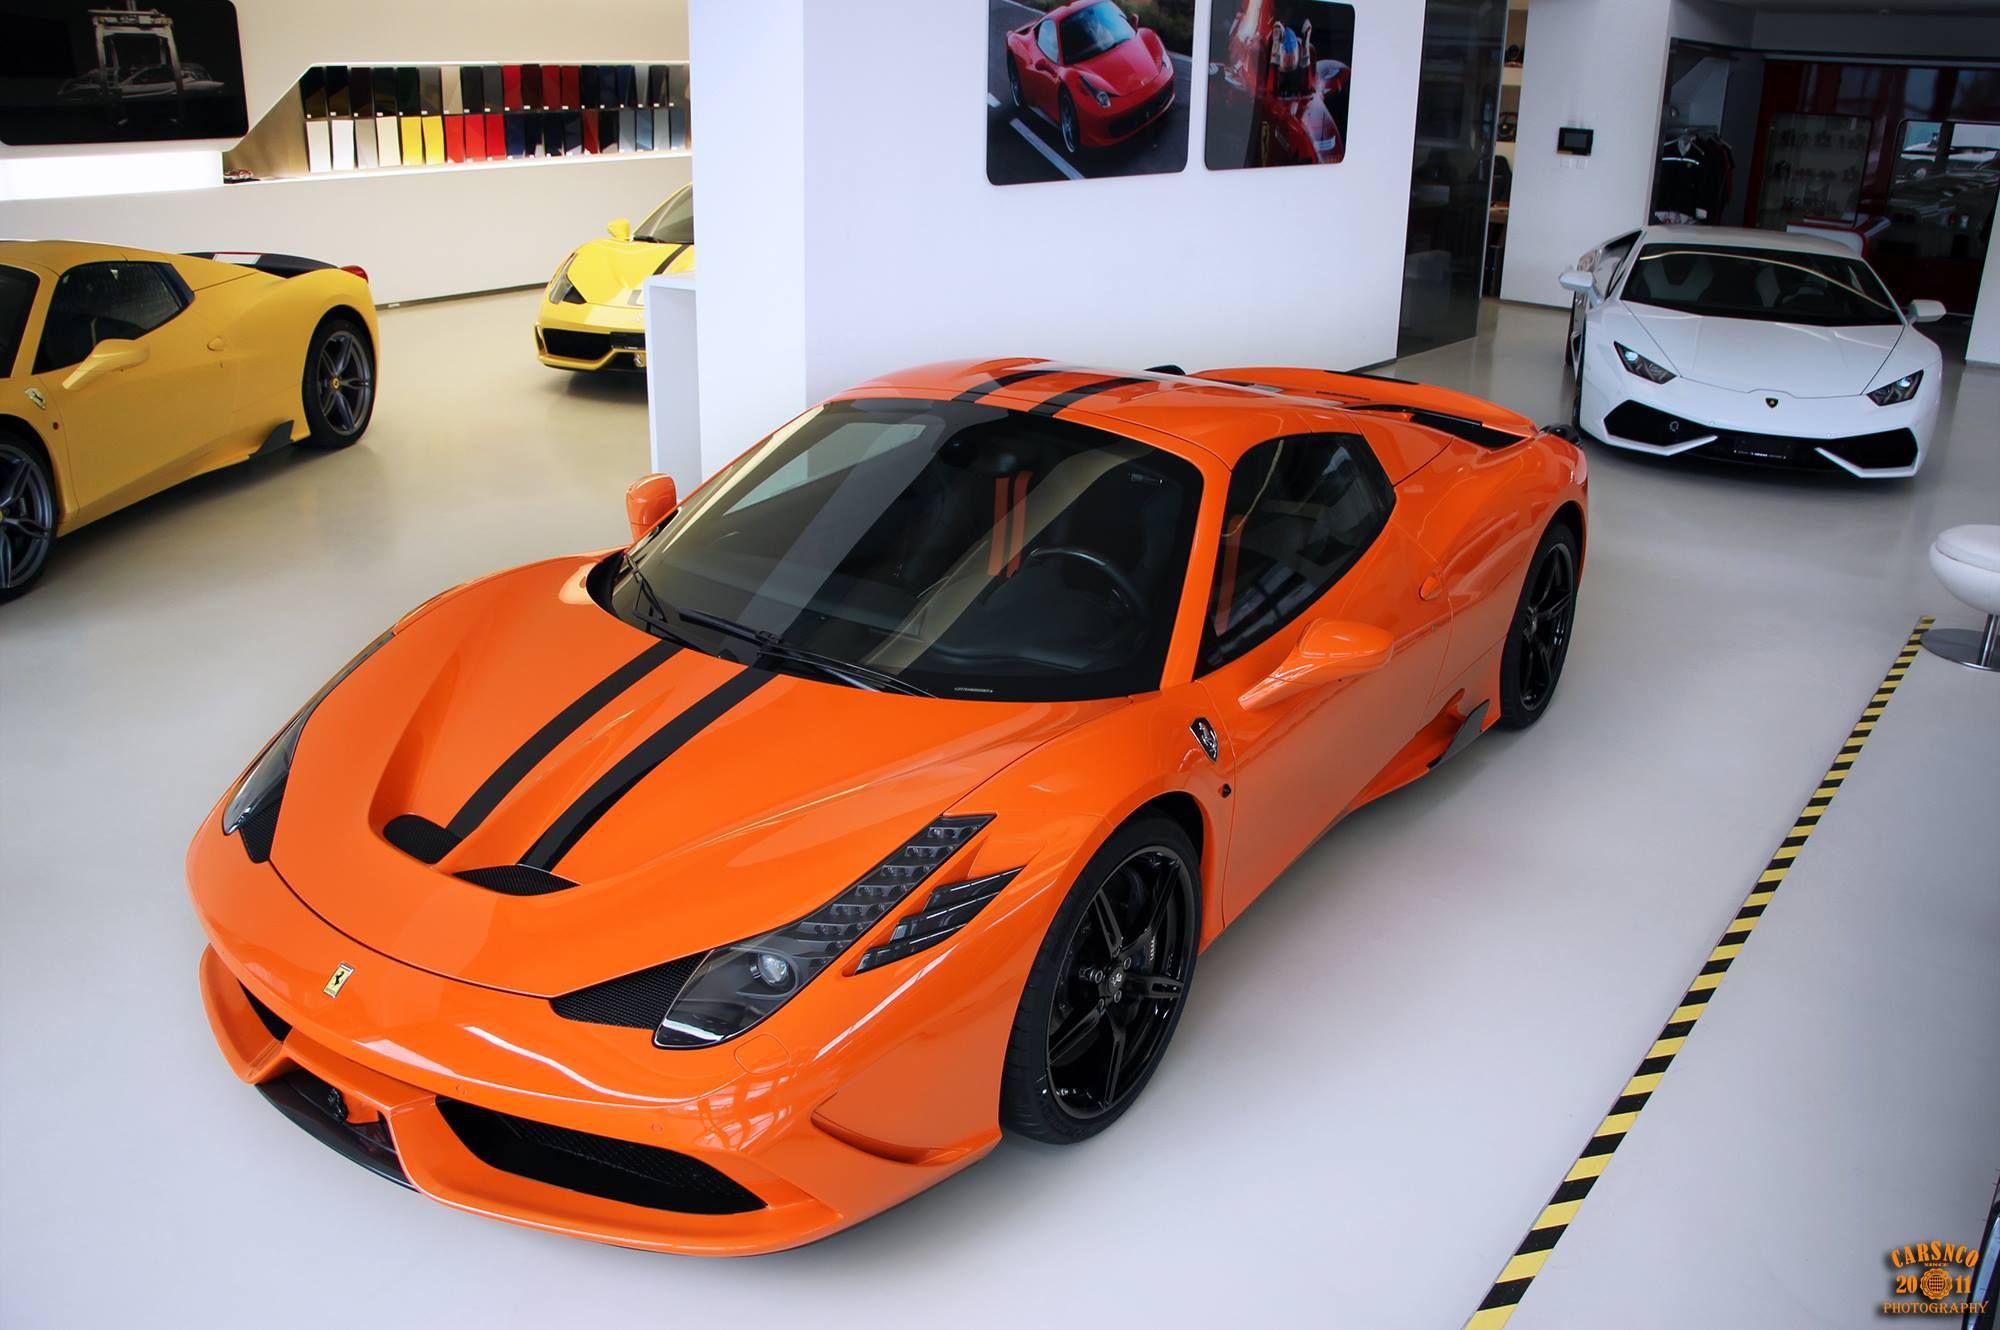 848c6a724646b1d9739b4497cd68aea9 Fabulous Ferrari Mondial T In Vendita Cars Trend